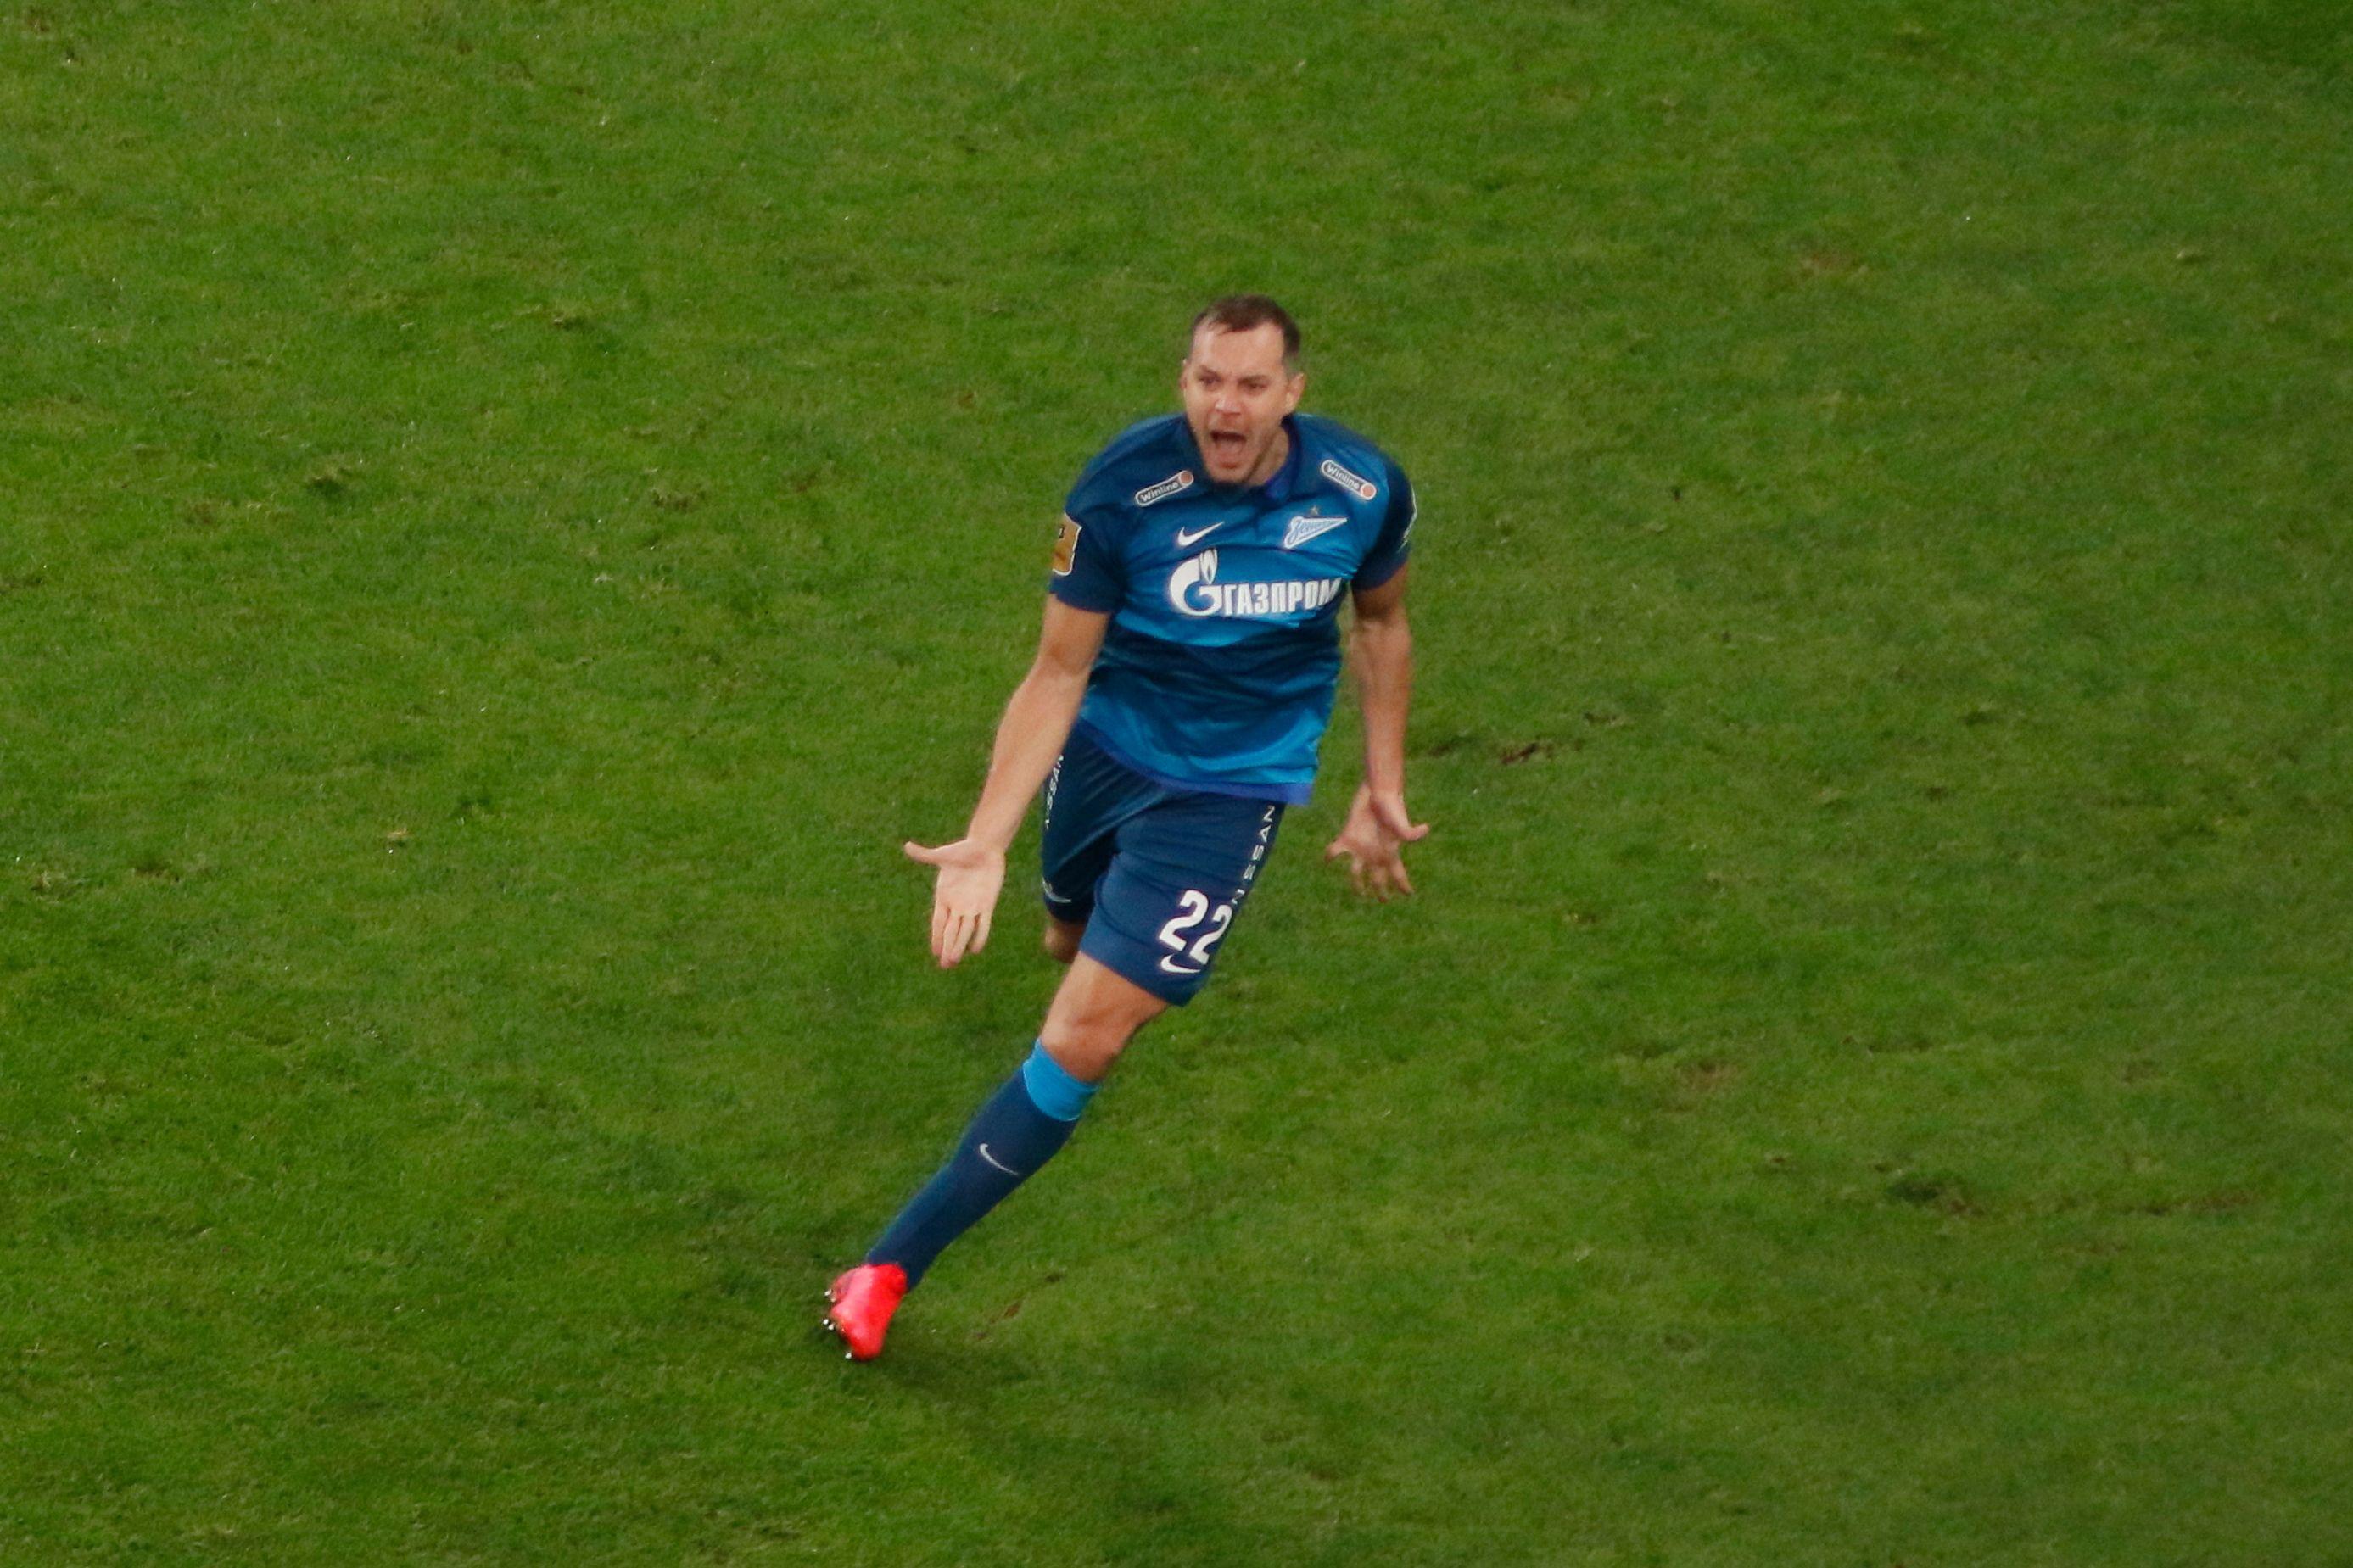 Дзюба: 'Для меня важны все голы в ворота 'Спартака'. Каждый гол как бальзам на душу'